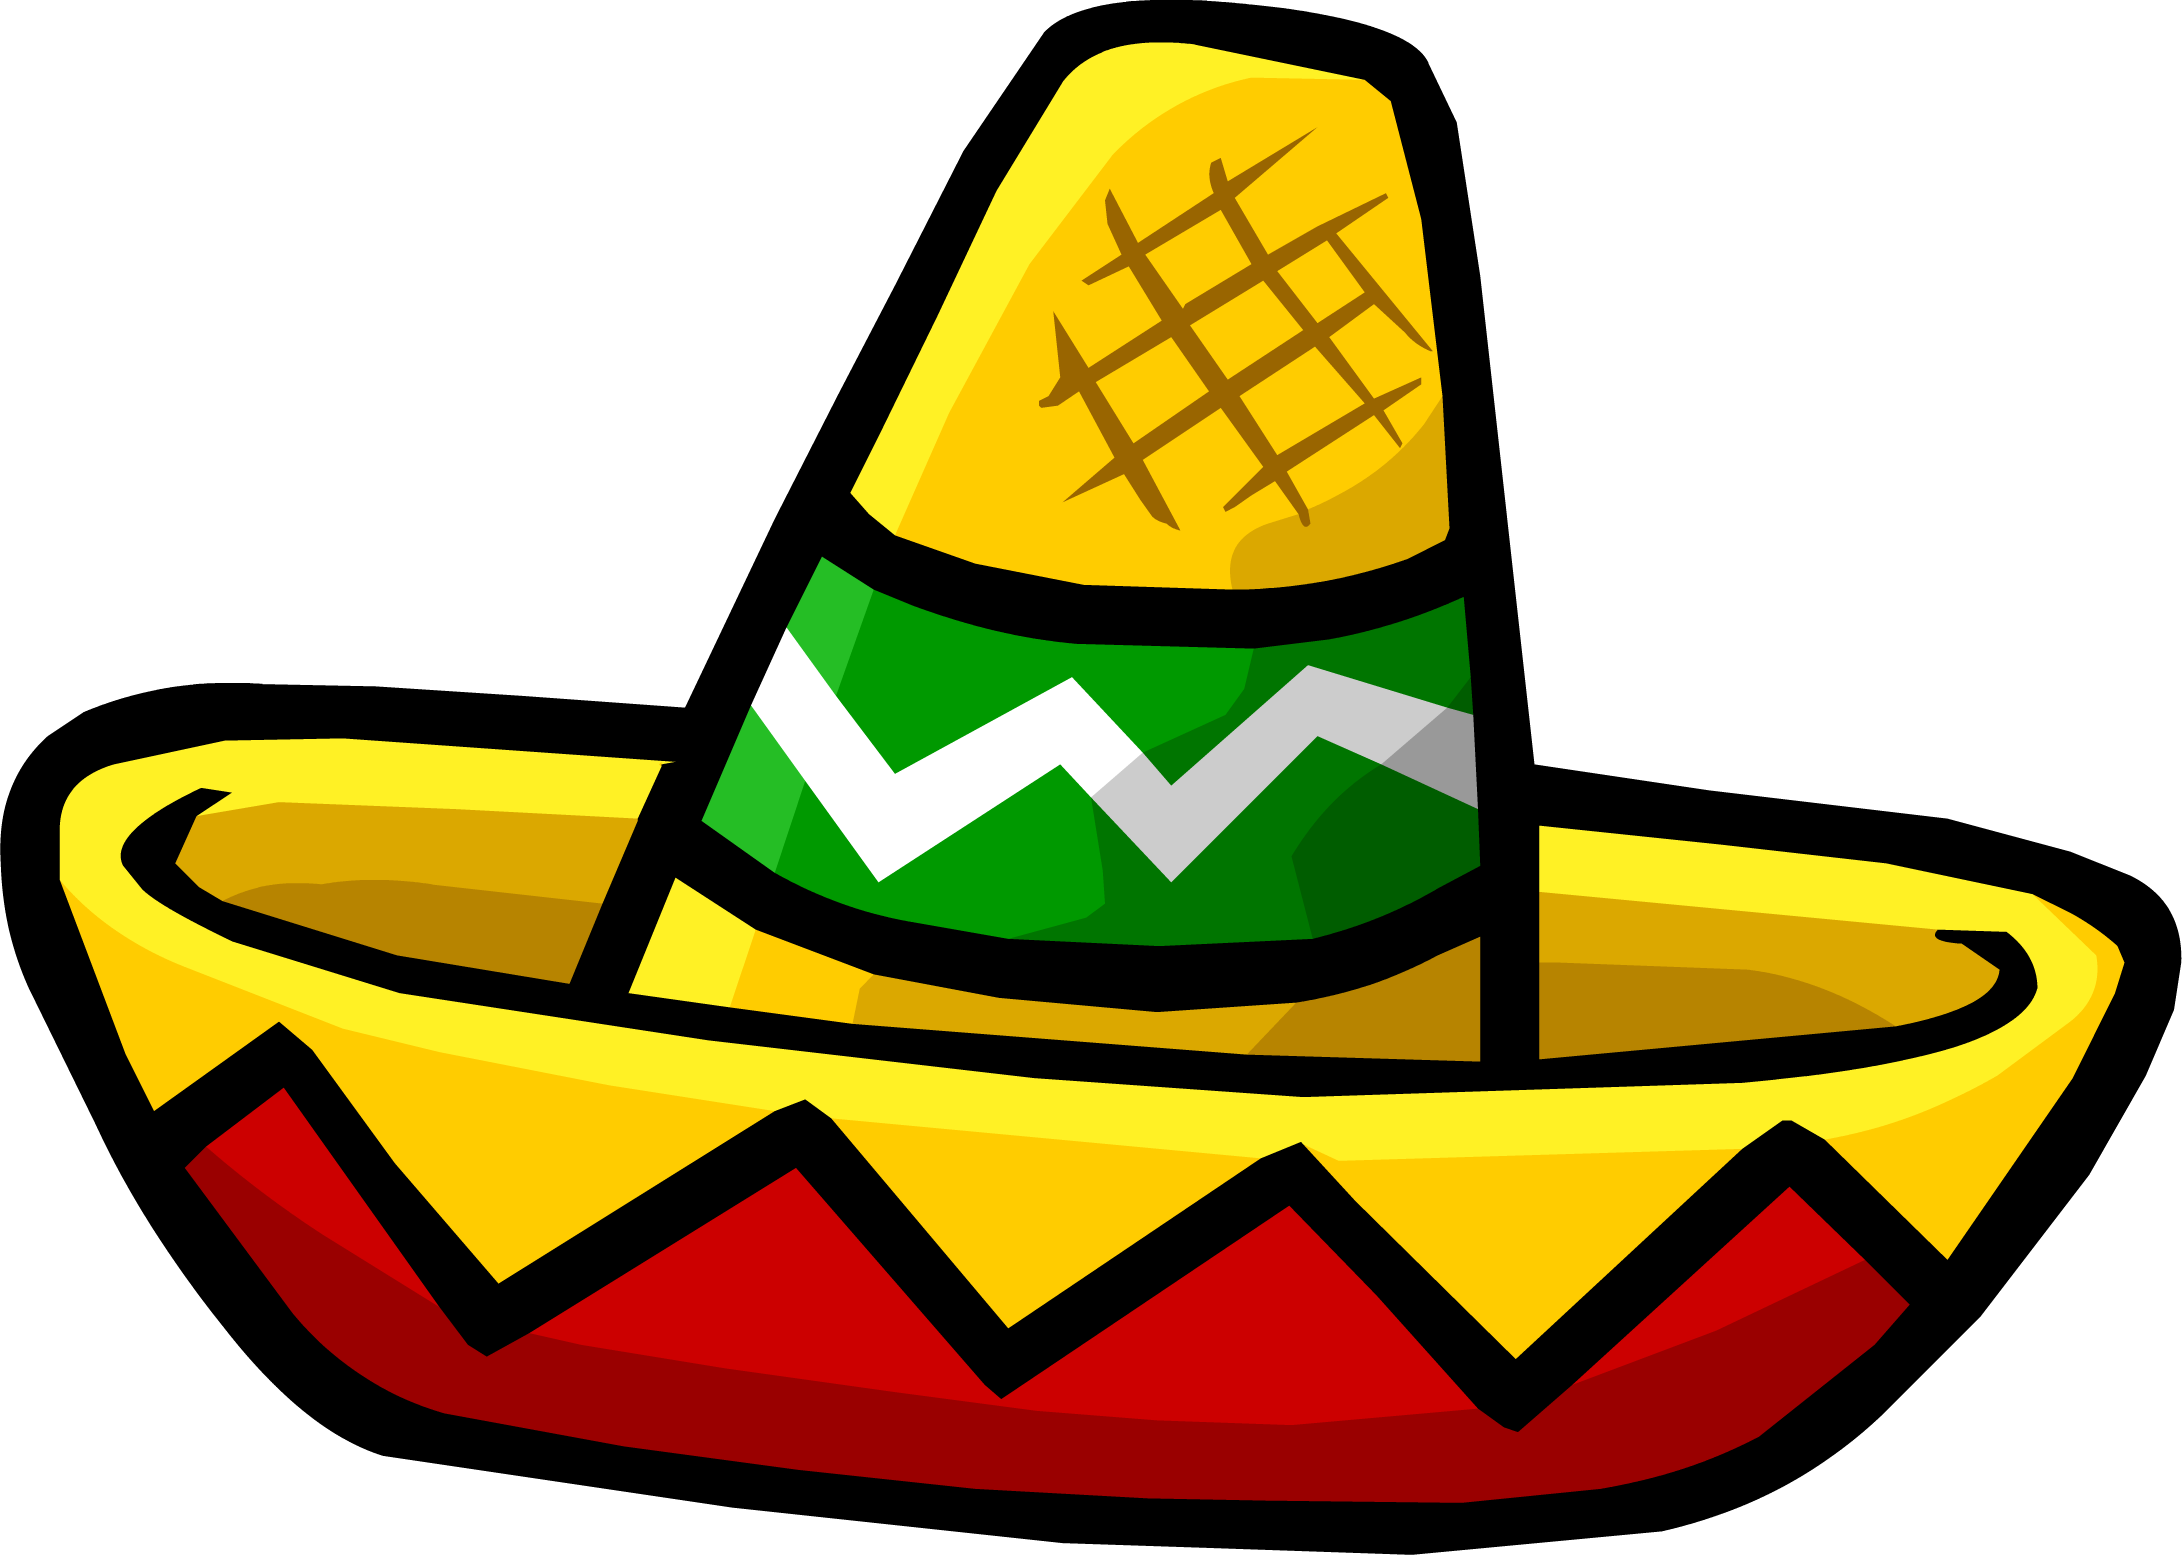 Sombrero Clipart Free Download Best Sombrero Clipart On Clipartmag Com